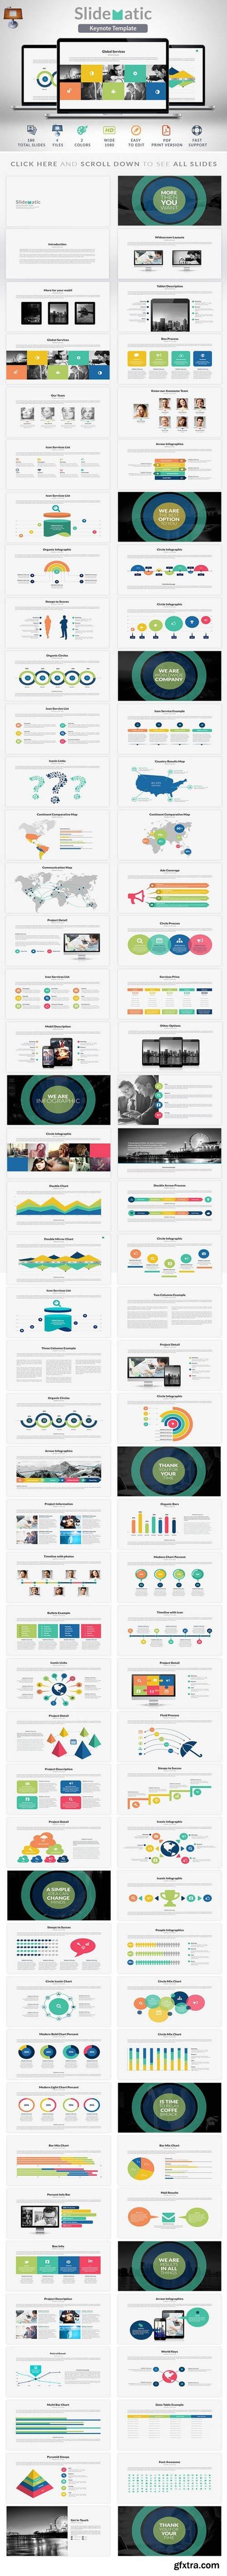 CM - Slidematic | Keynote Presentation 288483